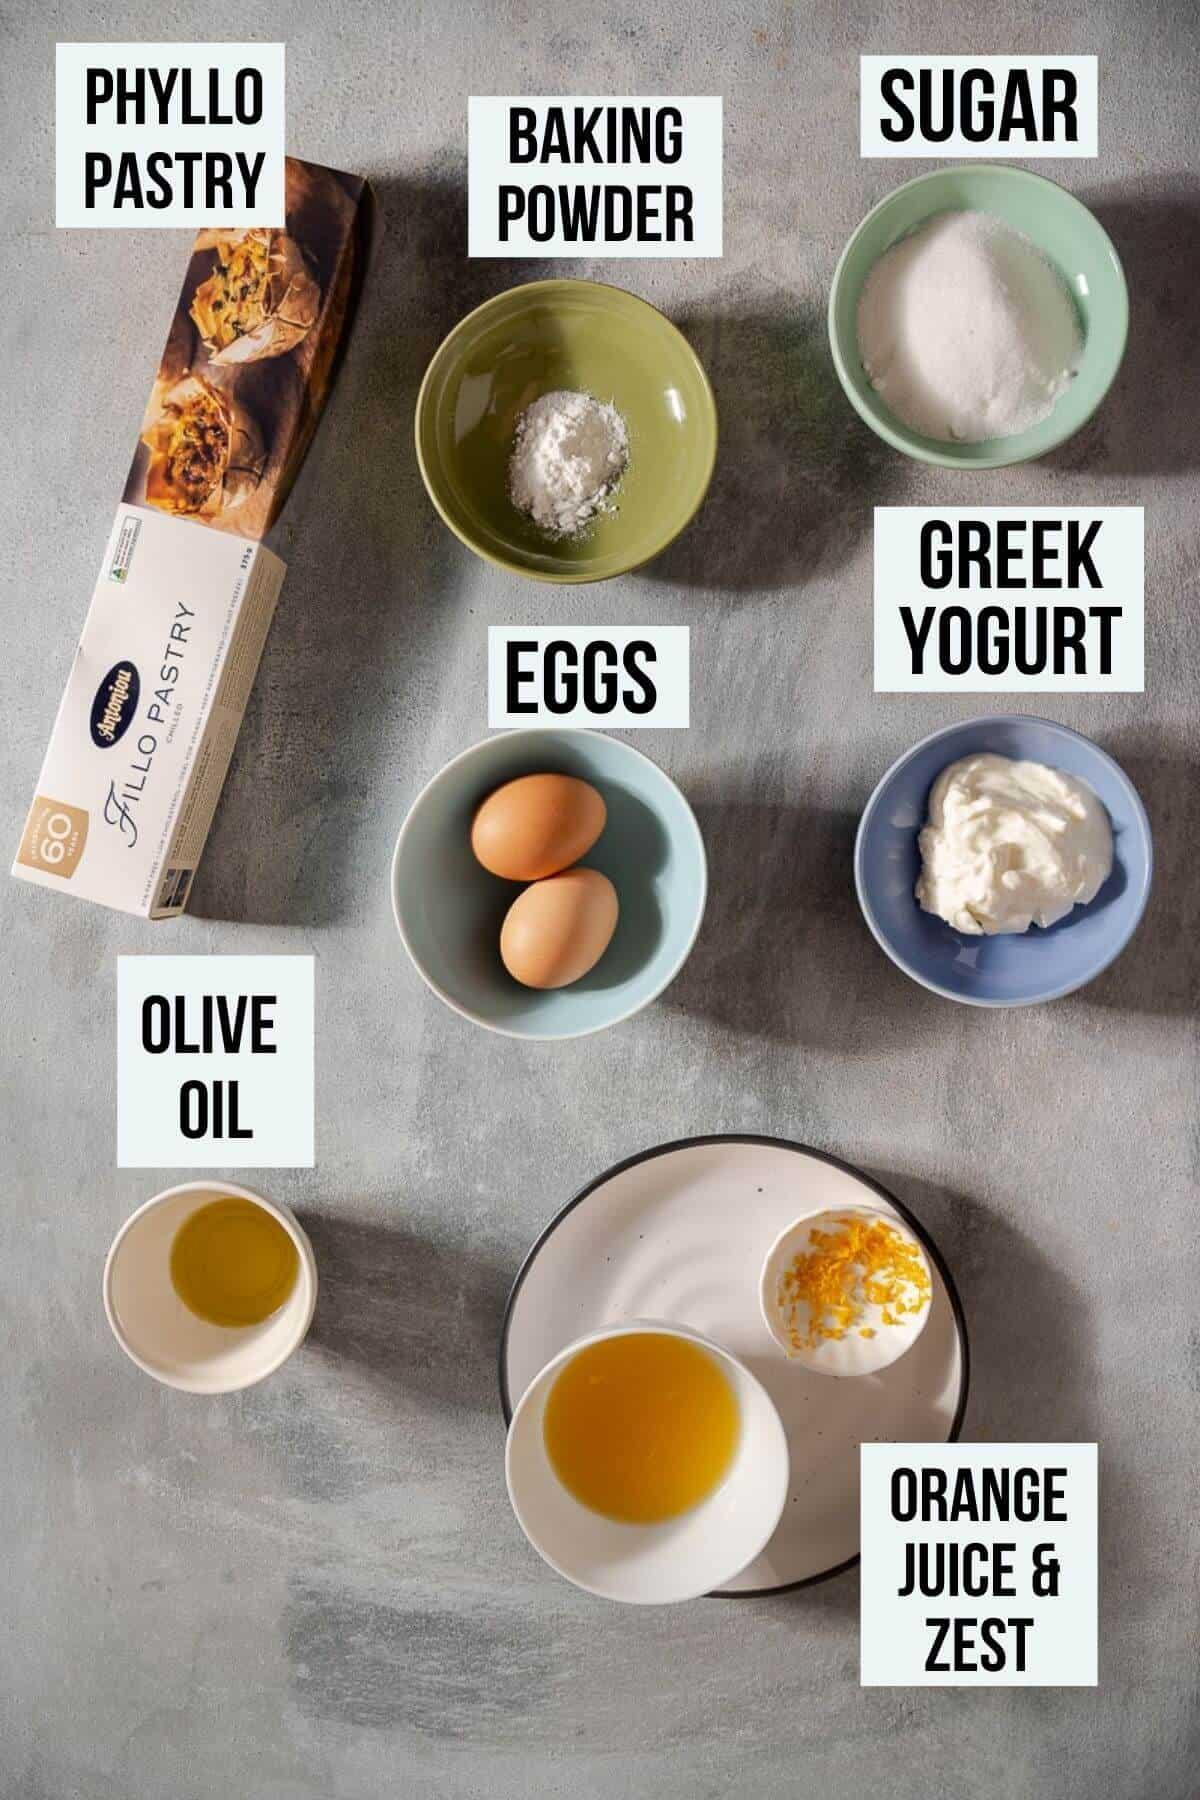 labelled ingredients on a grey table to make portokalopita.